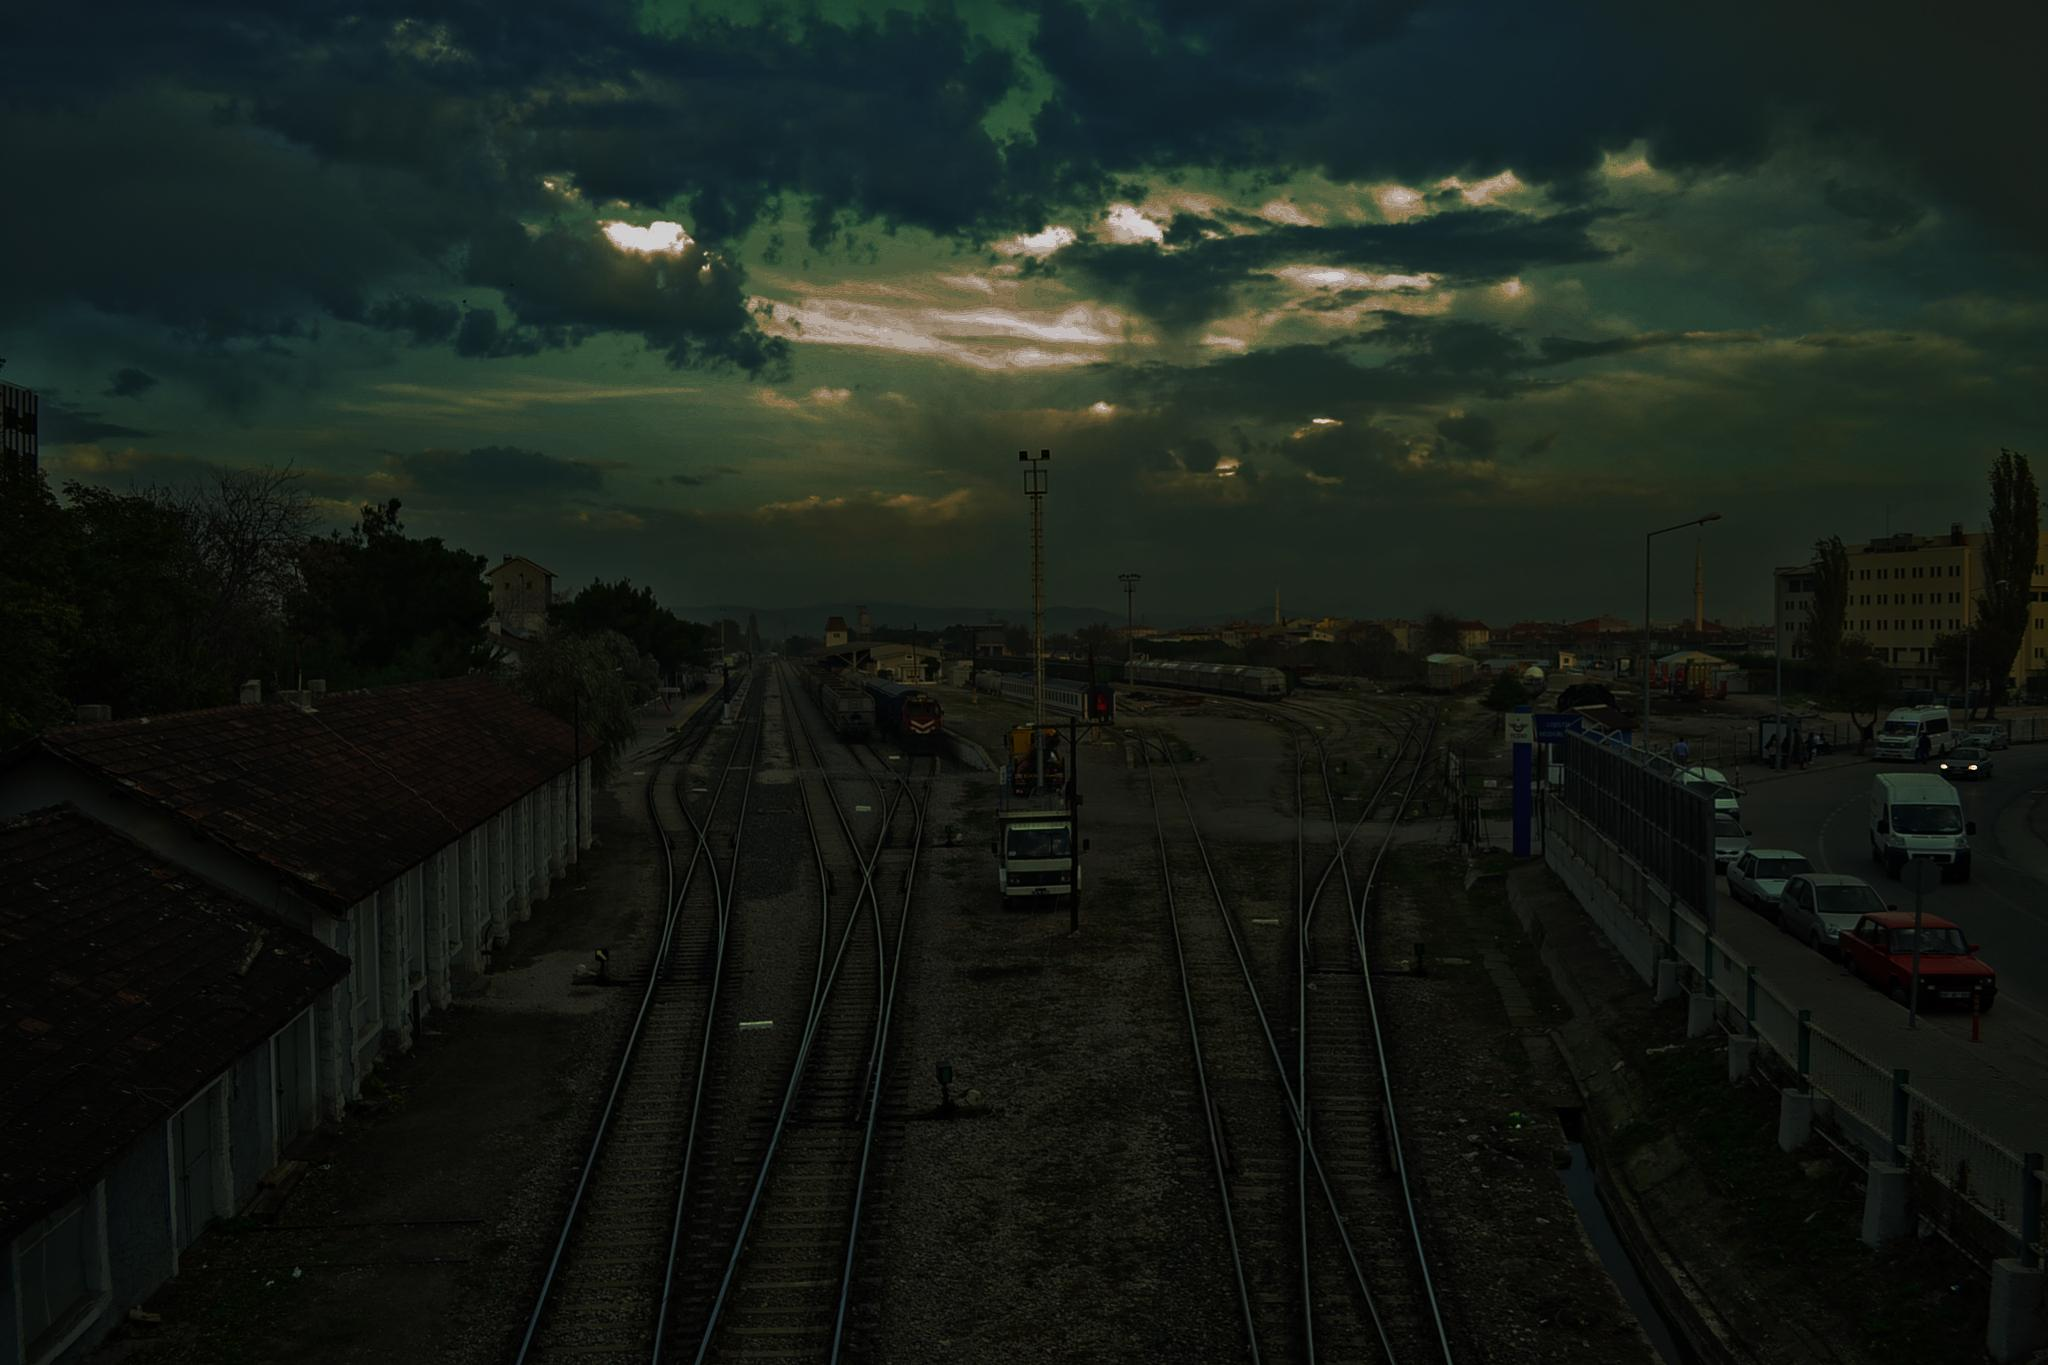 Untitled by enes.eren92